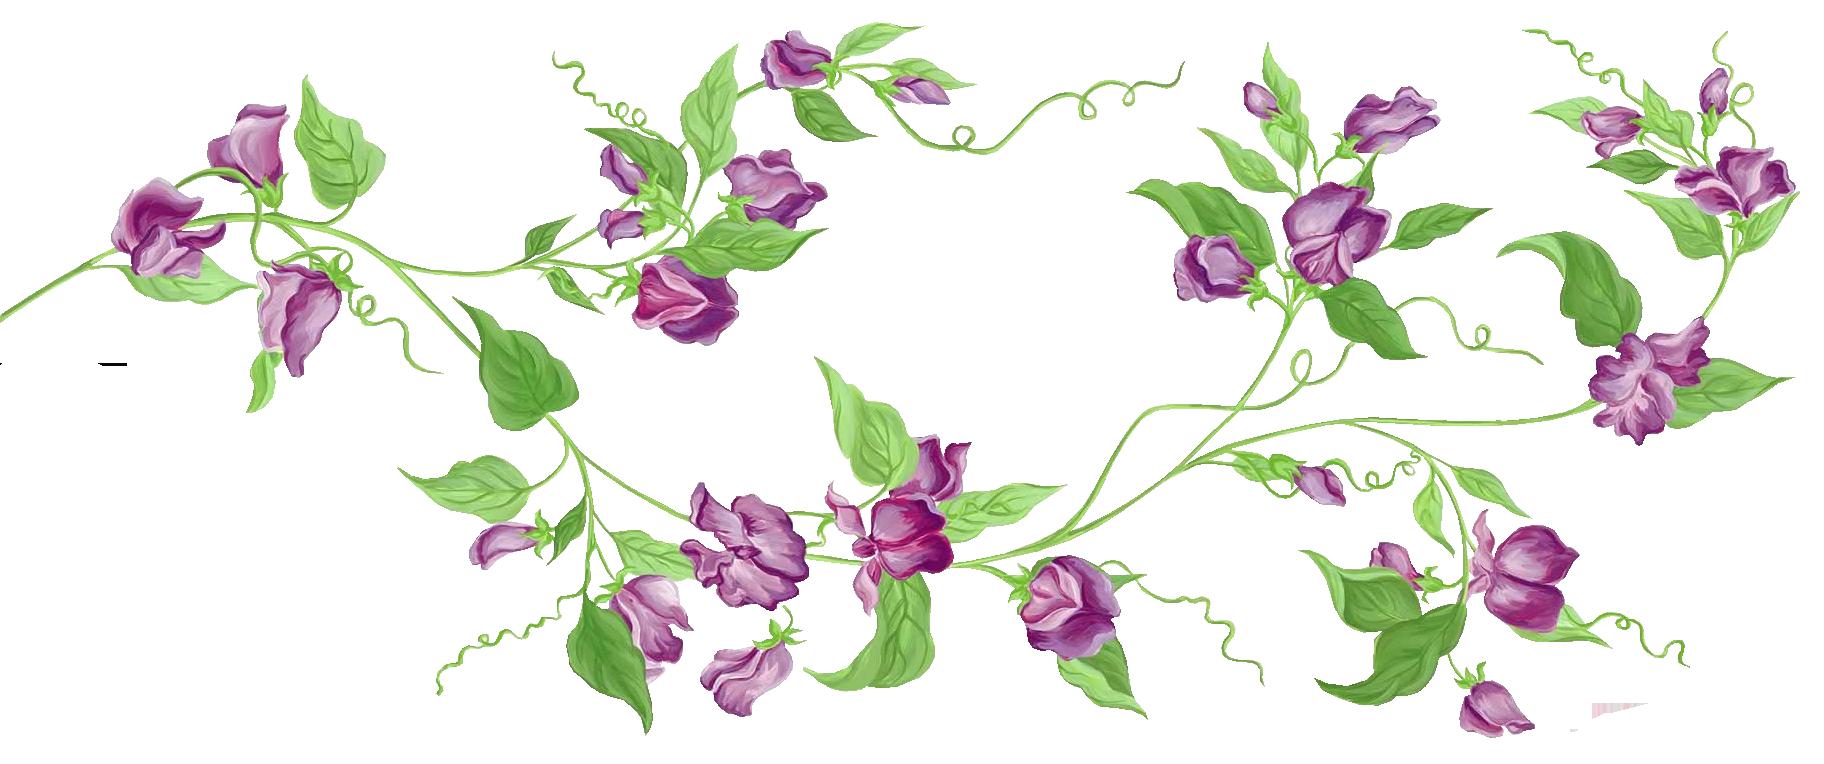 Transparent floral clipart jpg transparent Flower Purple Clip art - Transparent Floral Cliparts png ... jpg transparent